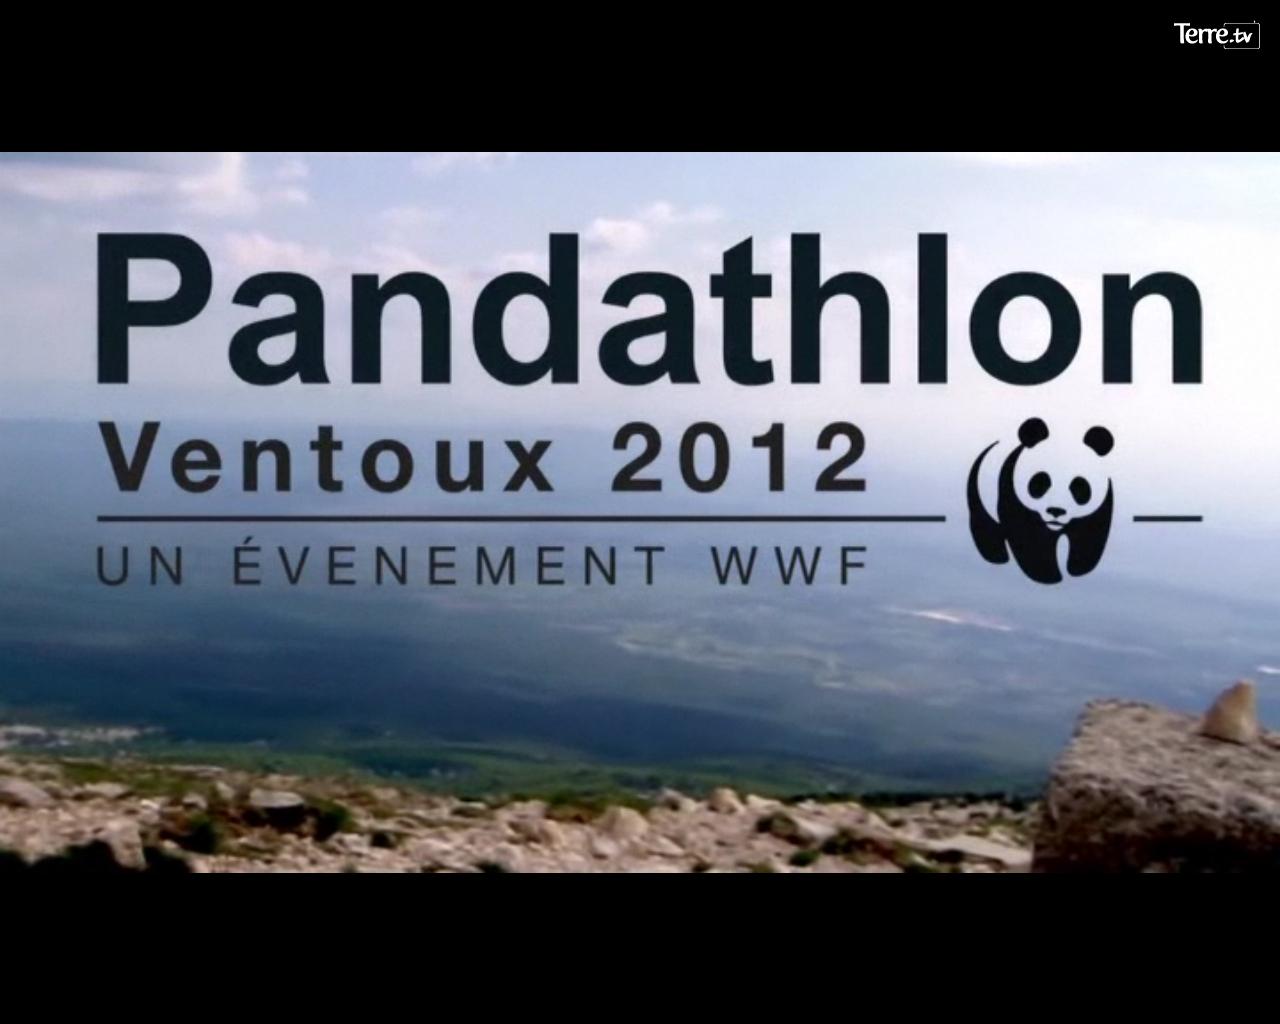 Pandathlon